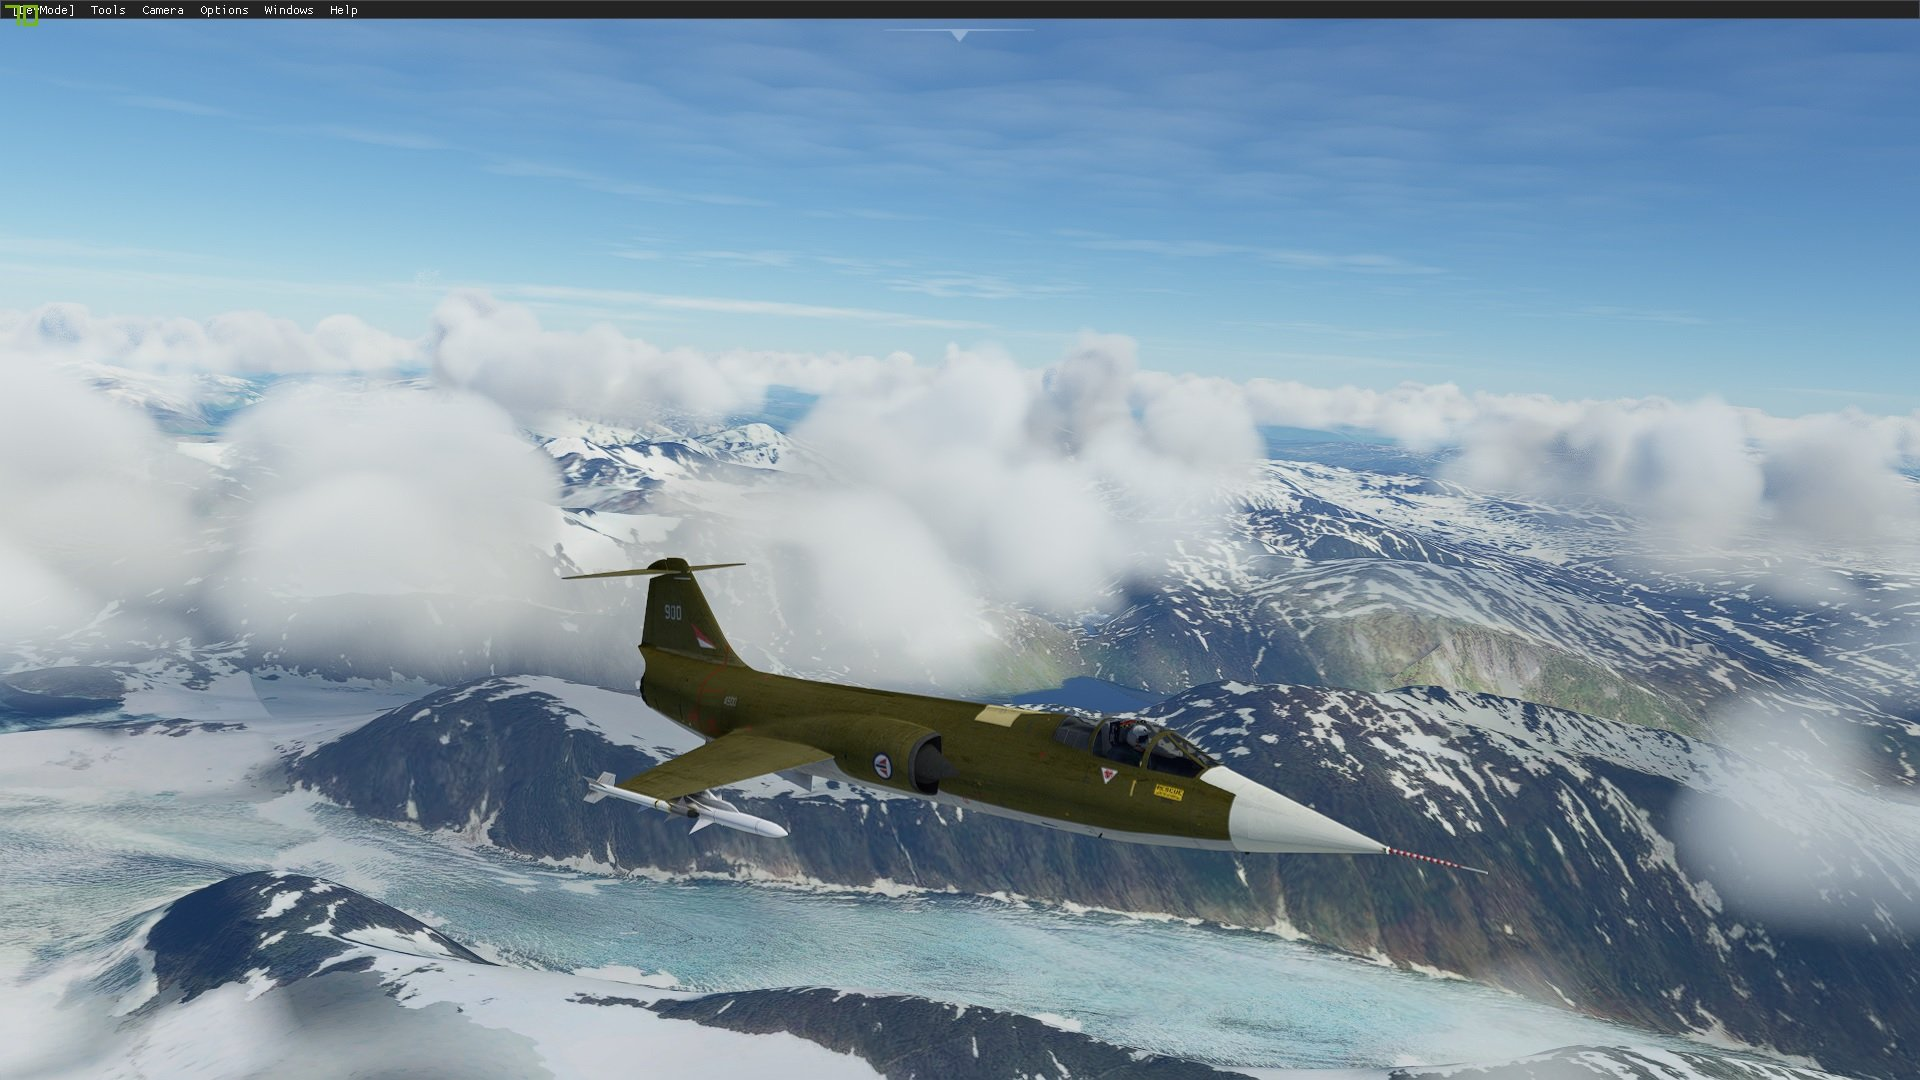 F-104_Svartisen.jpg.894b8e020f3f61fc3a86824baec15a45.jpg